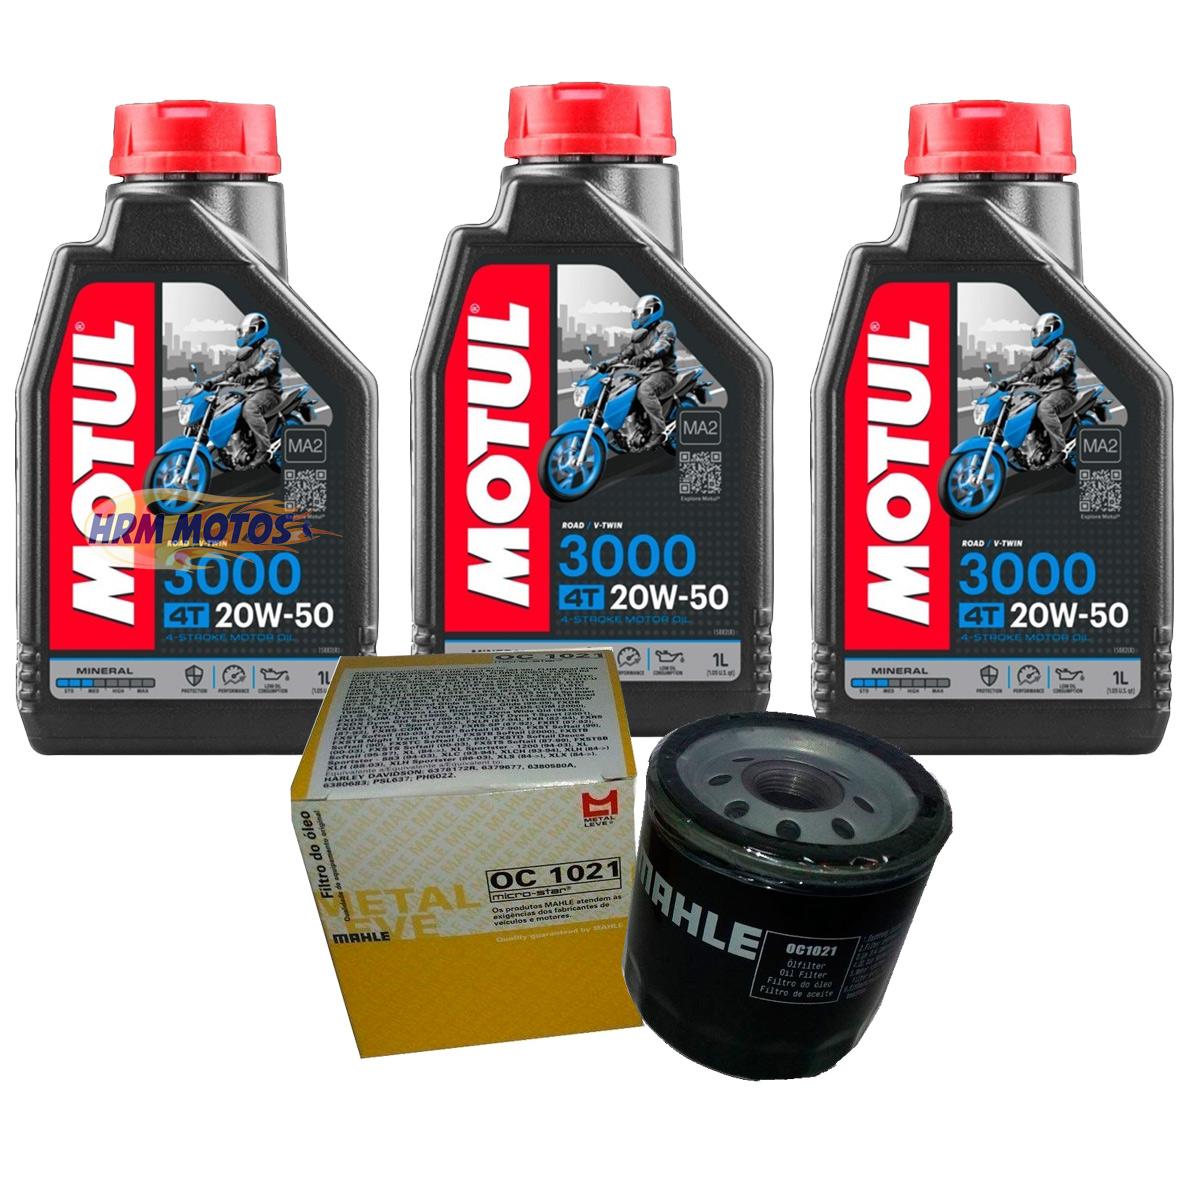 Kit Filtro De Óleo Harley 883/1200 E 3 Lts Motul 3000 20w50 OC1021-6022